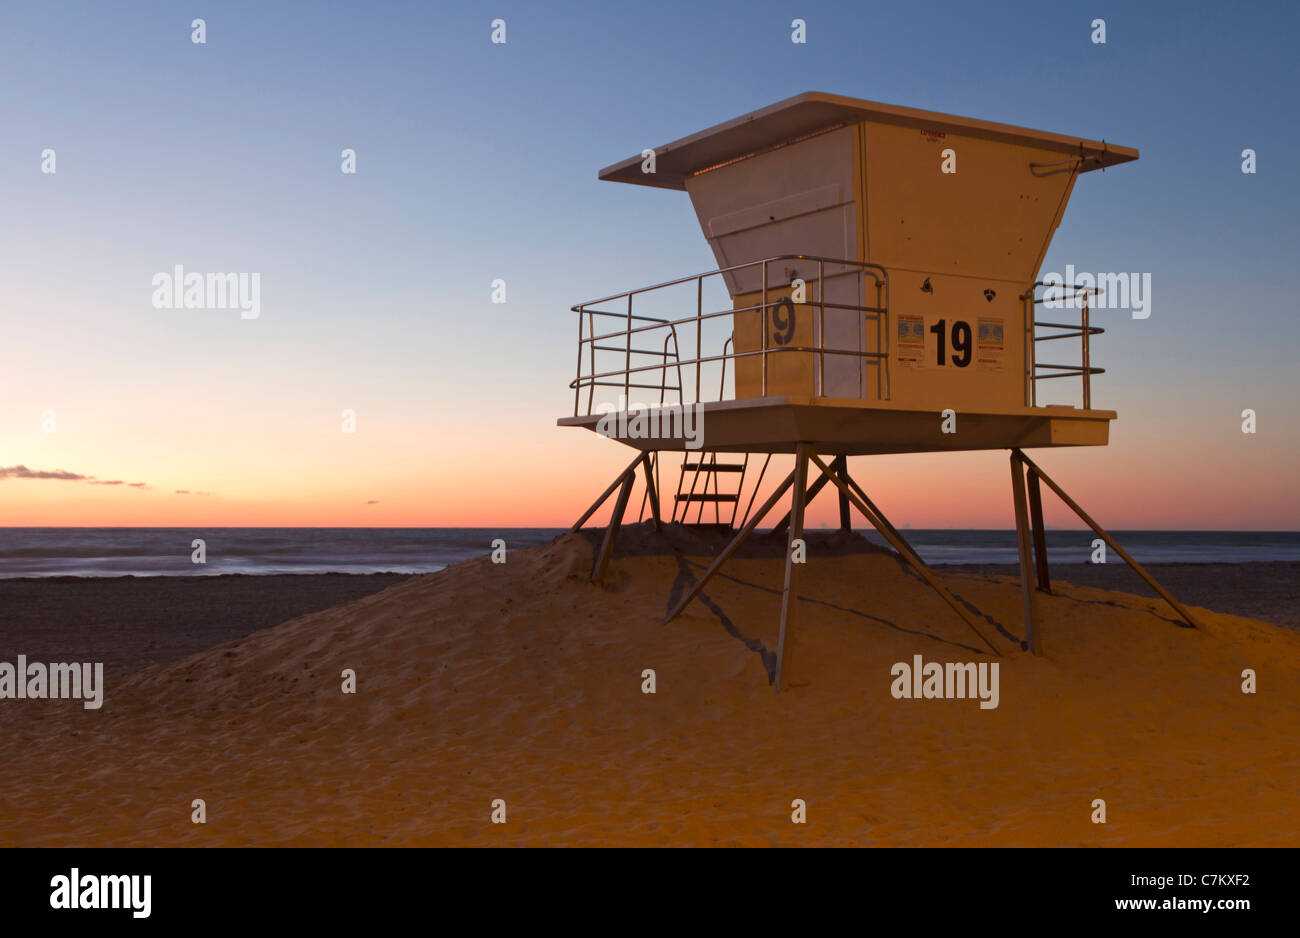 Guard tower at a beach, California, USA - Stock Image